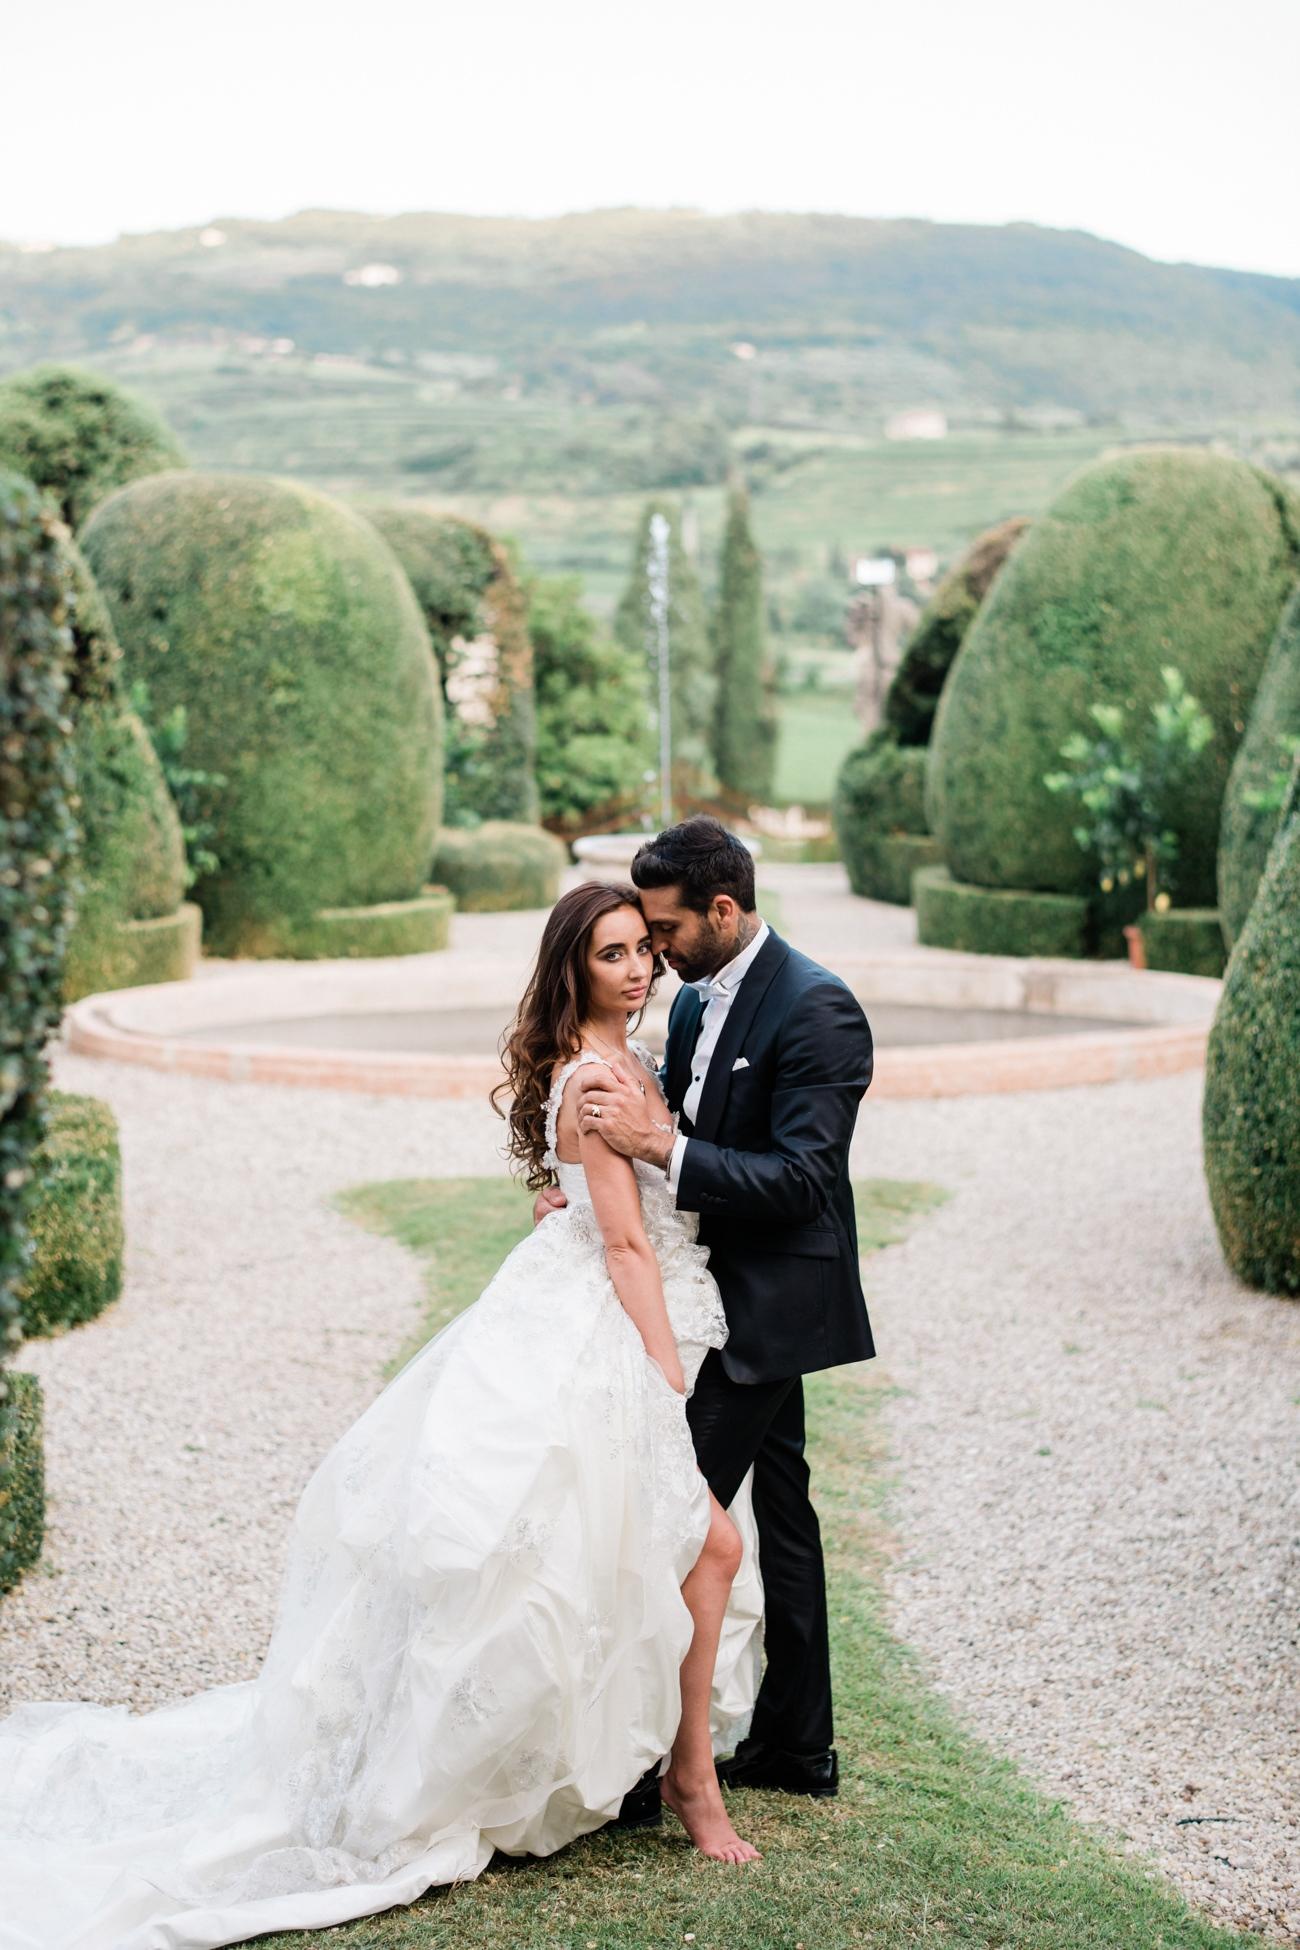 Wedding Photographer Lake Garda - Wedding Photographer Verona